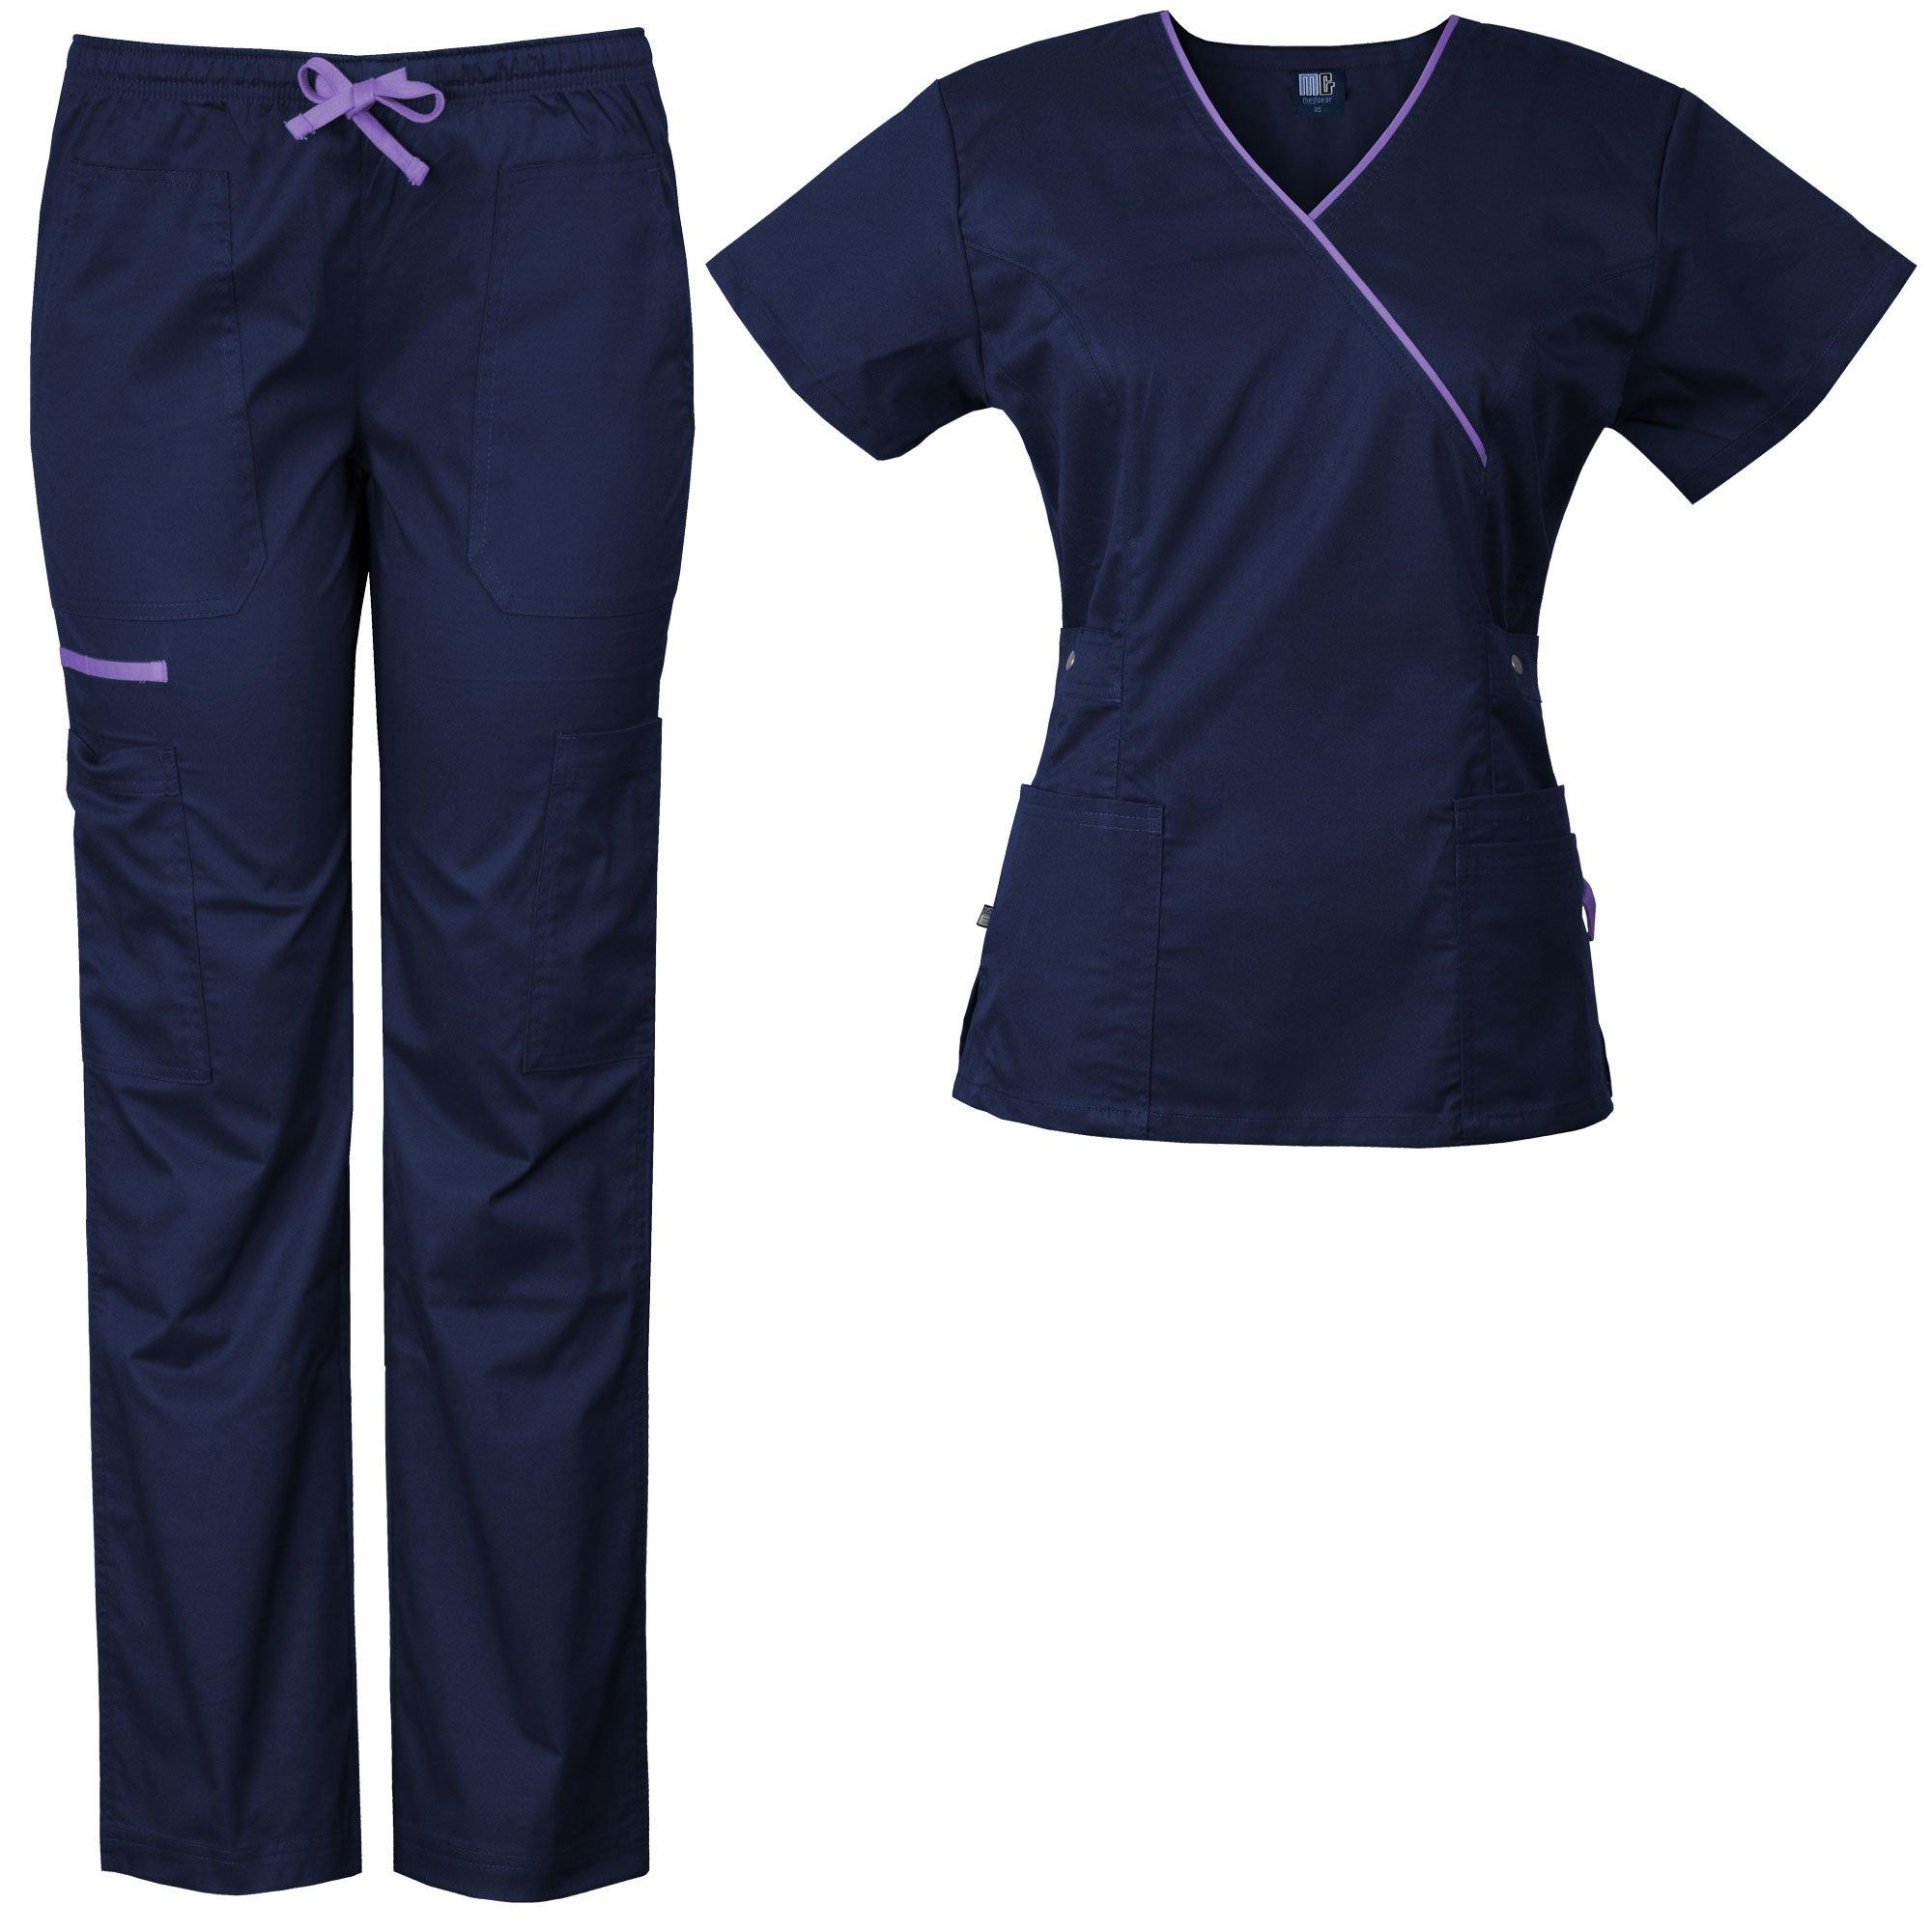 Medgear Women's Stretch Scrubs Set 5-Pocket Top & Multi-Pocket Pants (M, Navy/Lavender)